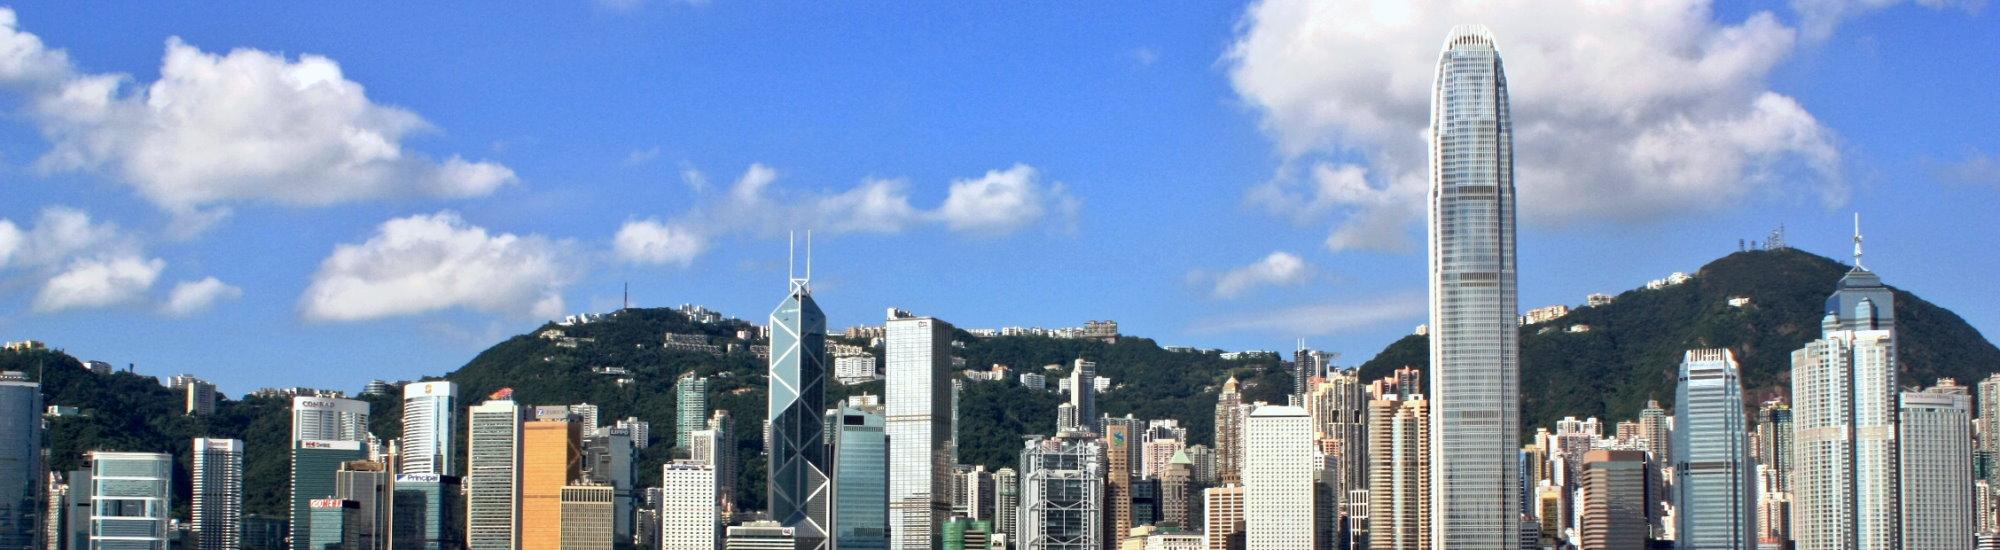 Hong_Kong_Island_Skyline_2009_2000x550